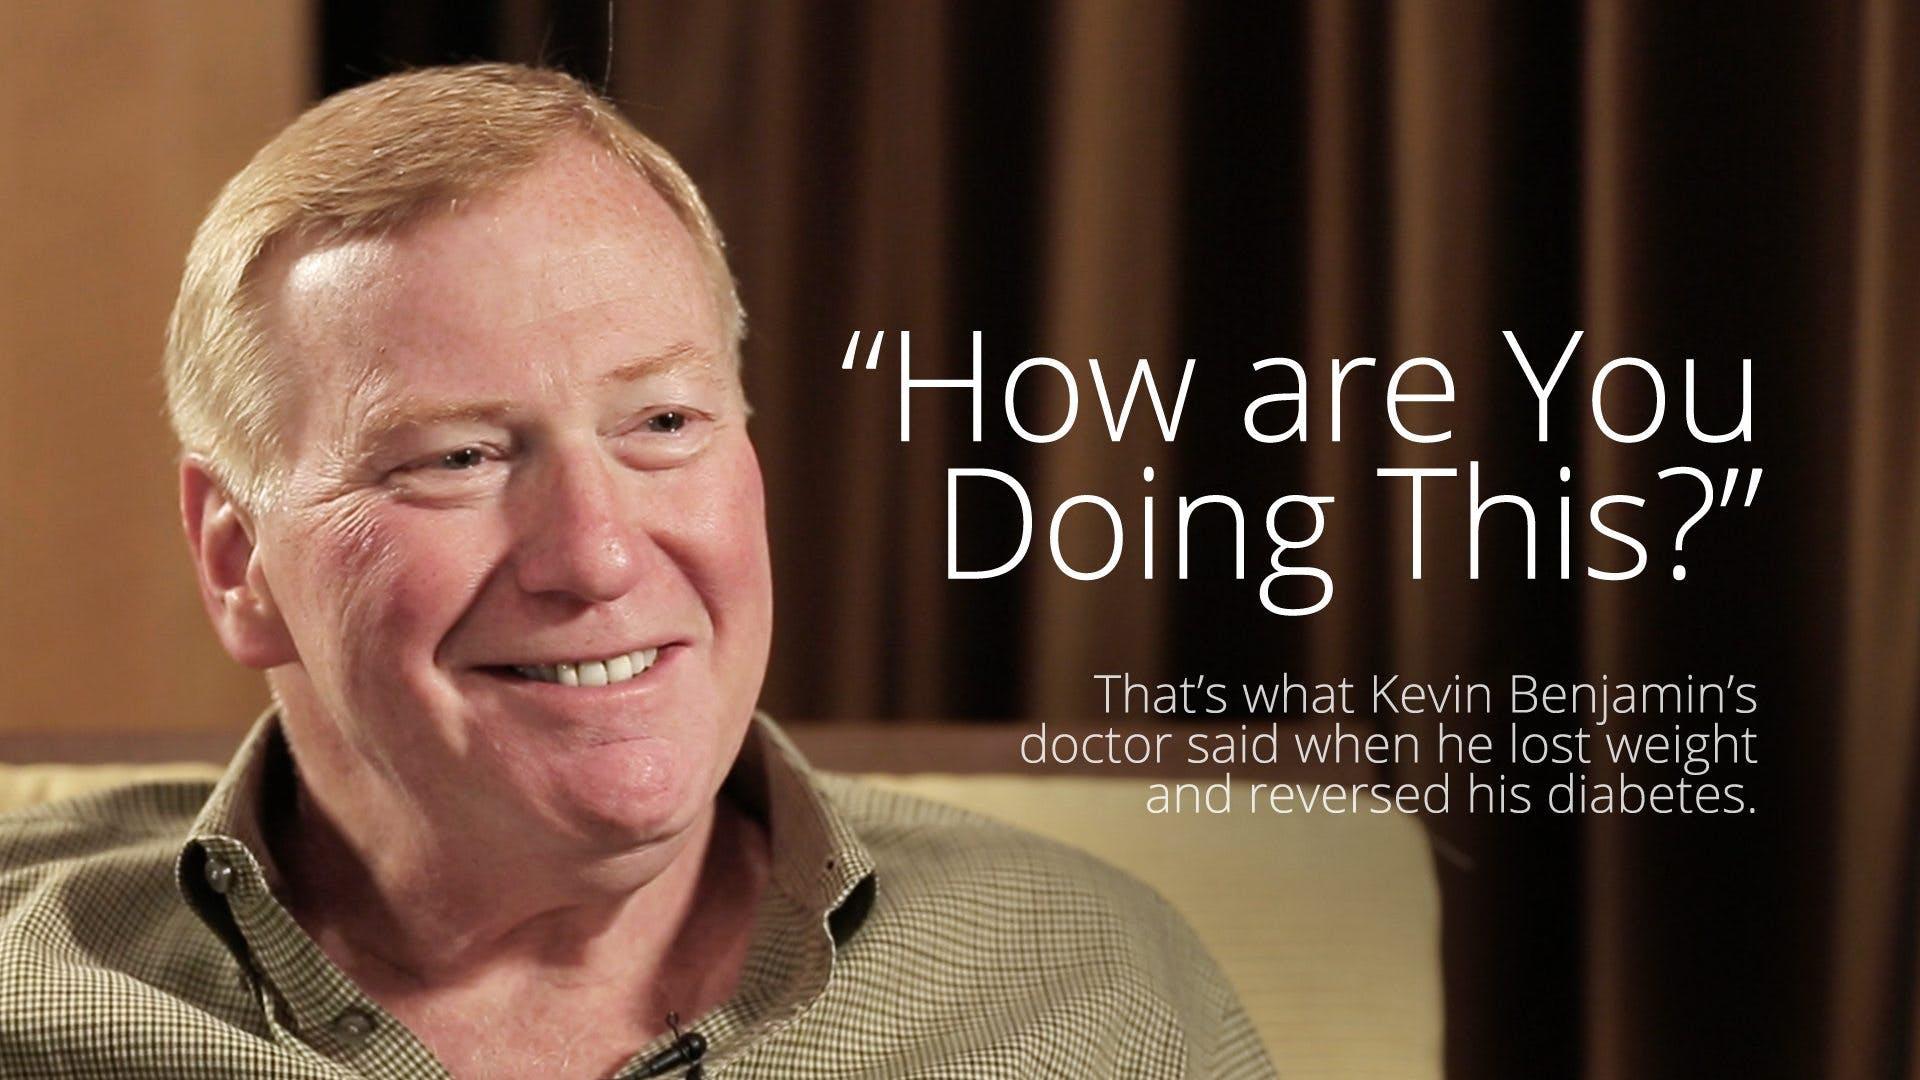 How Kevin Benjamin reversed his type 2 diabetes